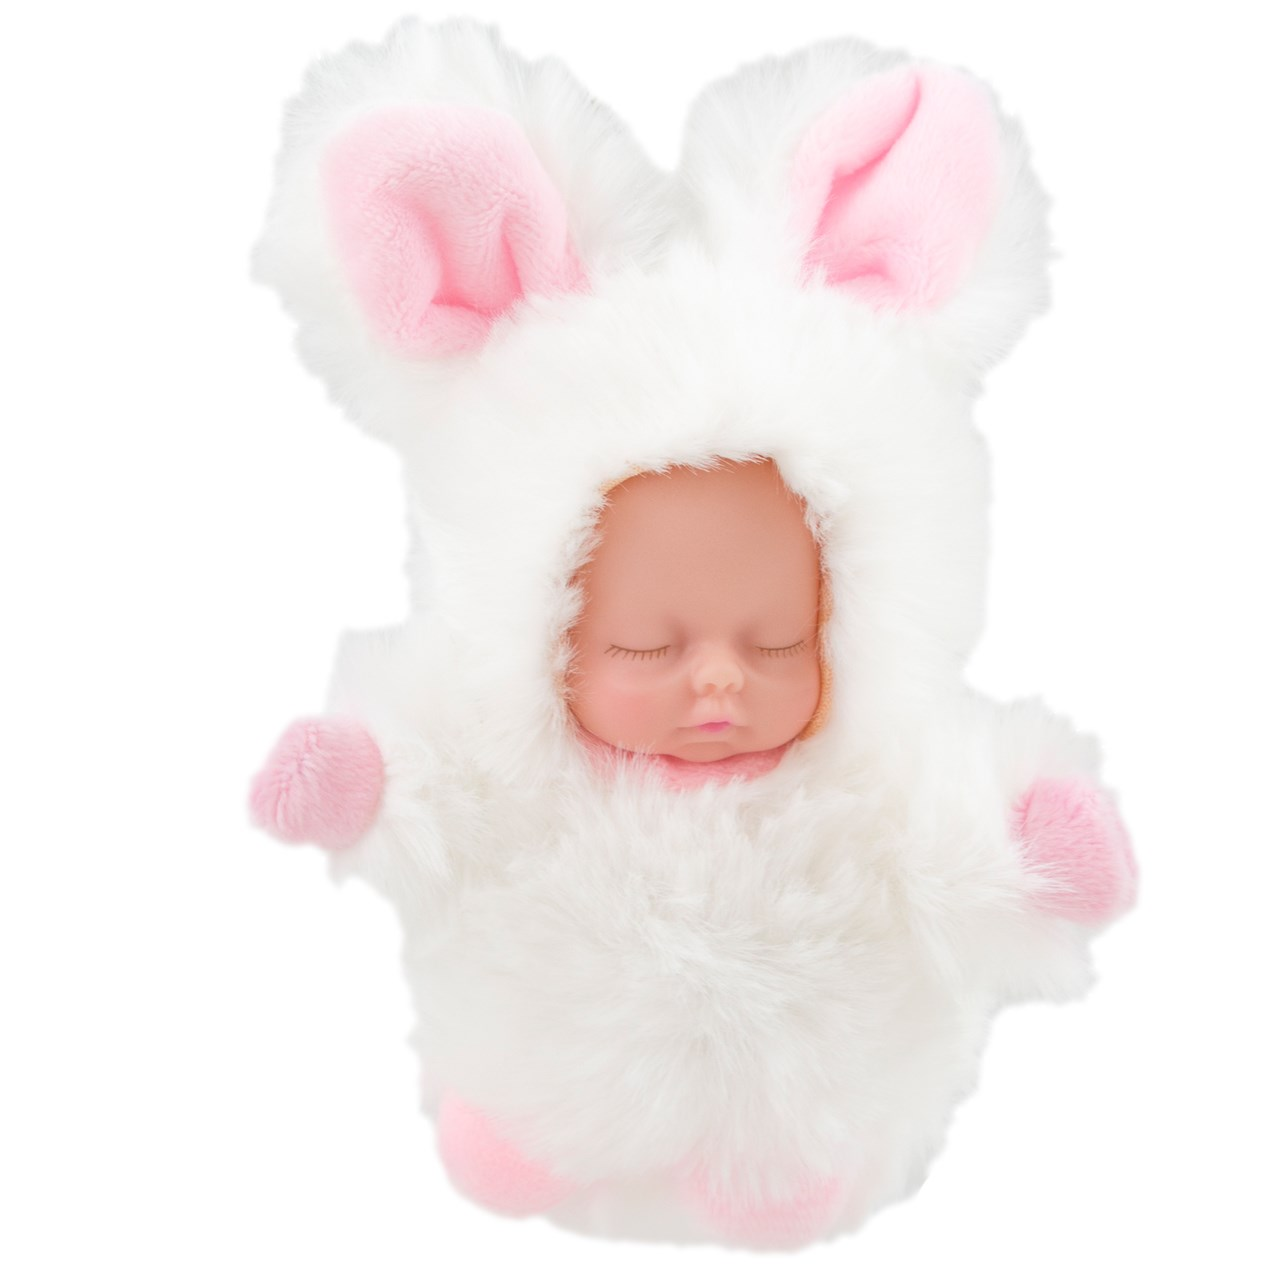 عکس آویز و جاسوئیچی نوزاد لاکچری مدل White Rabbit Dress